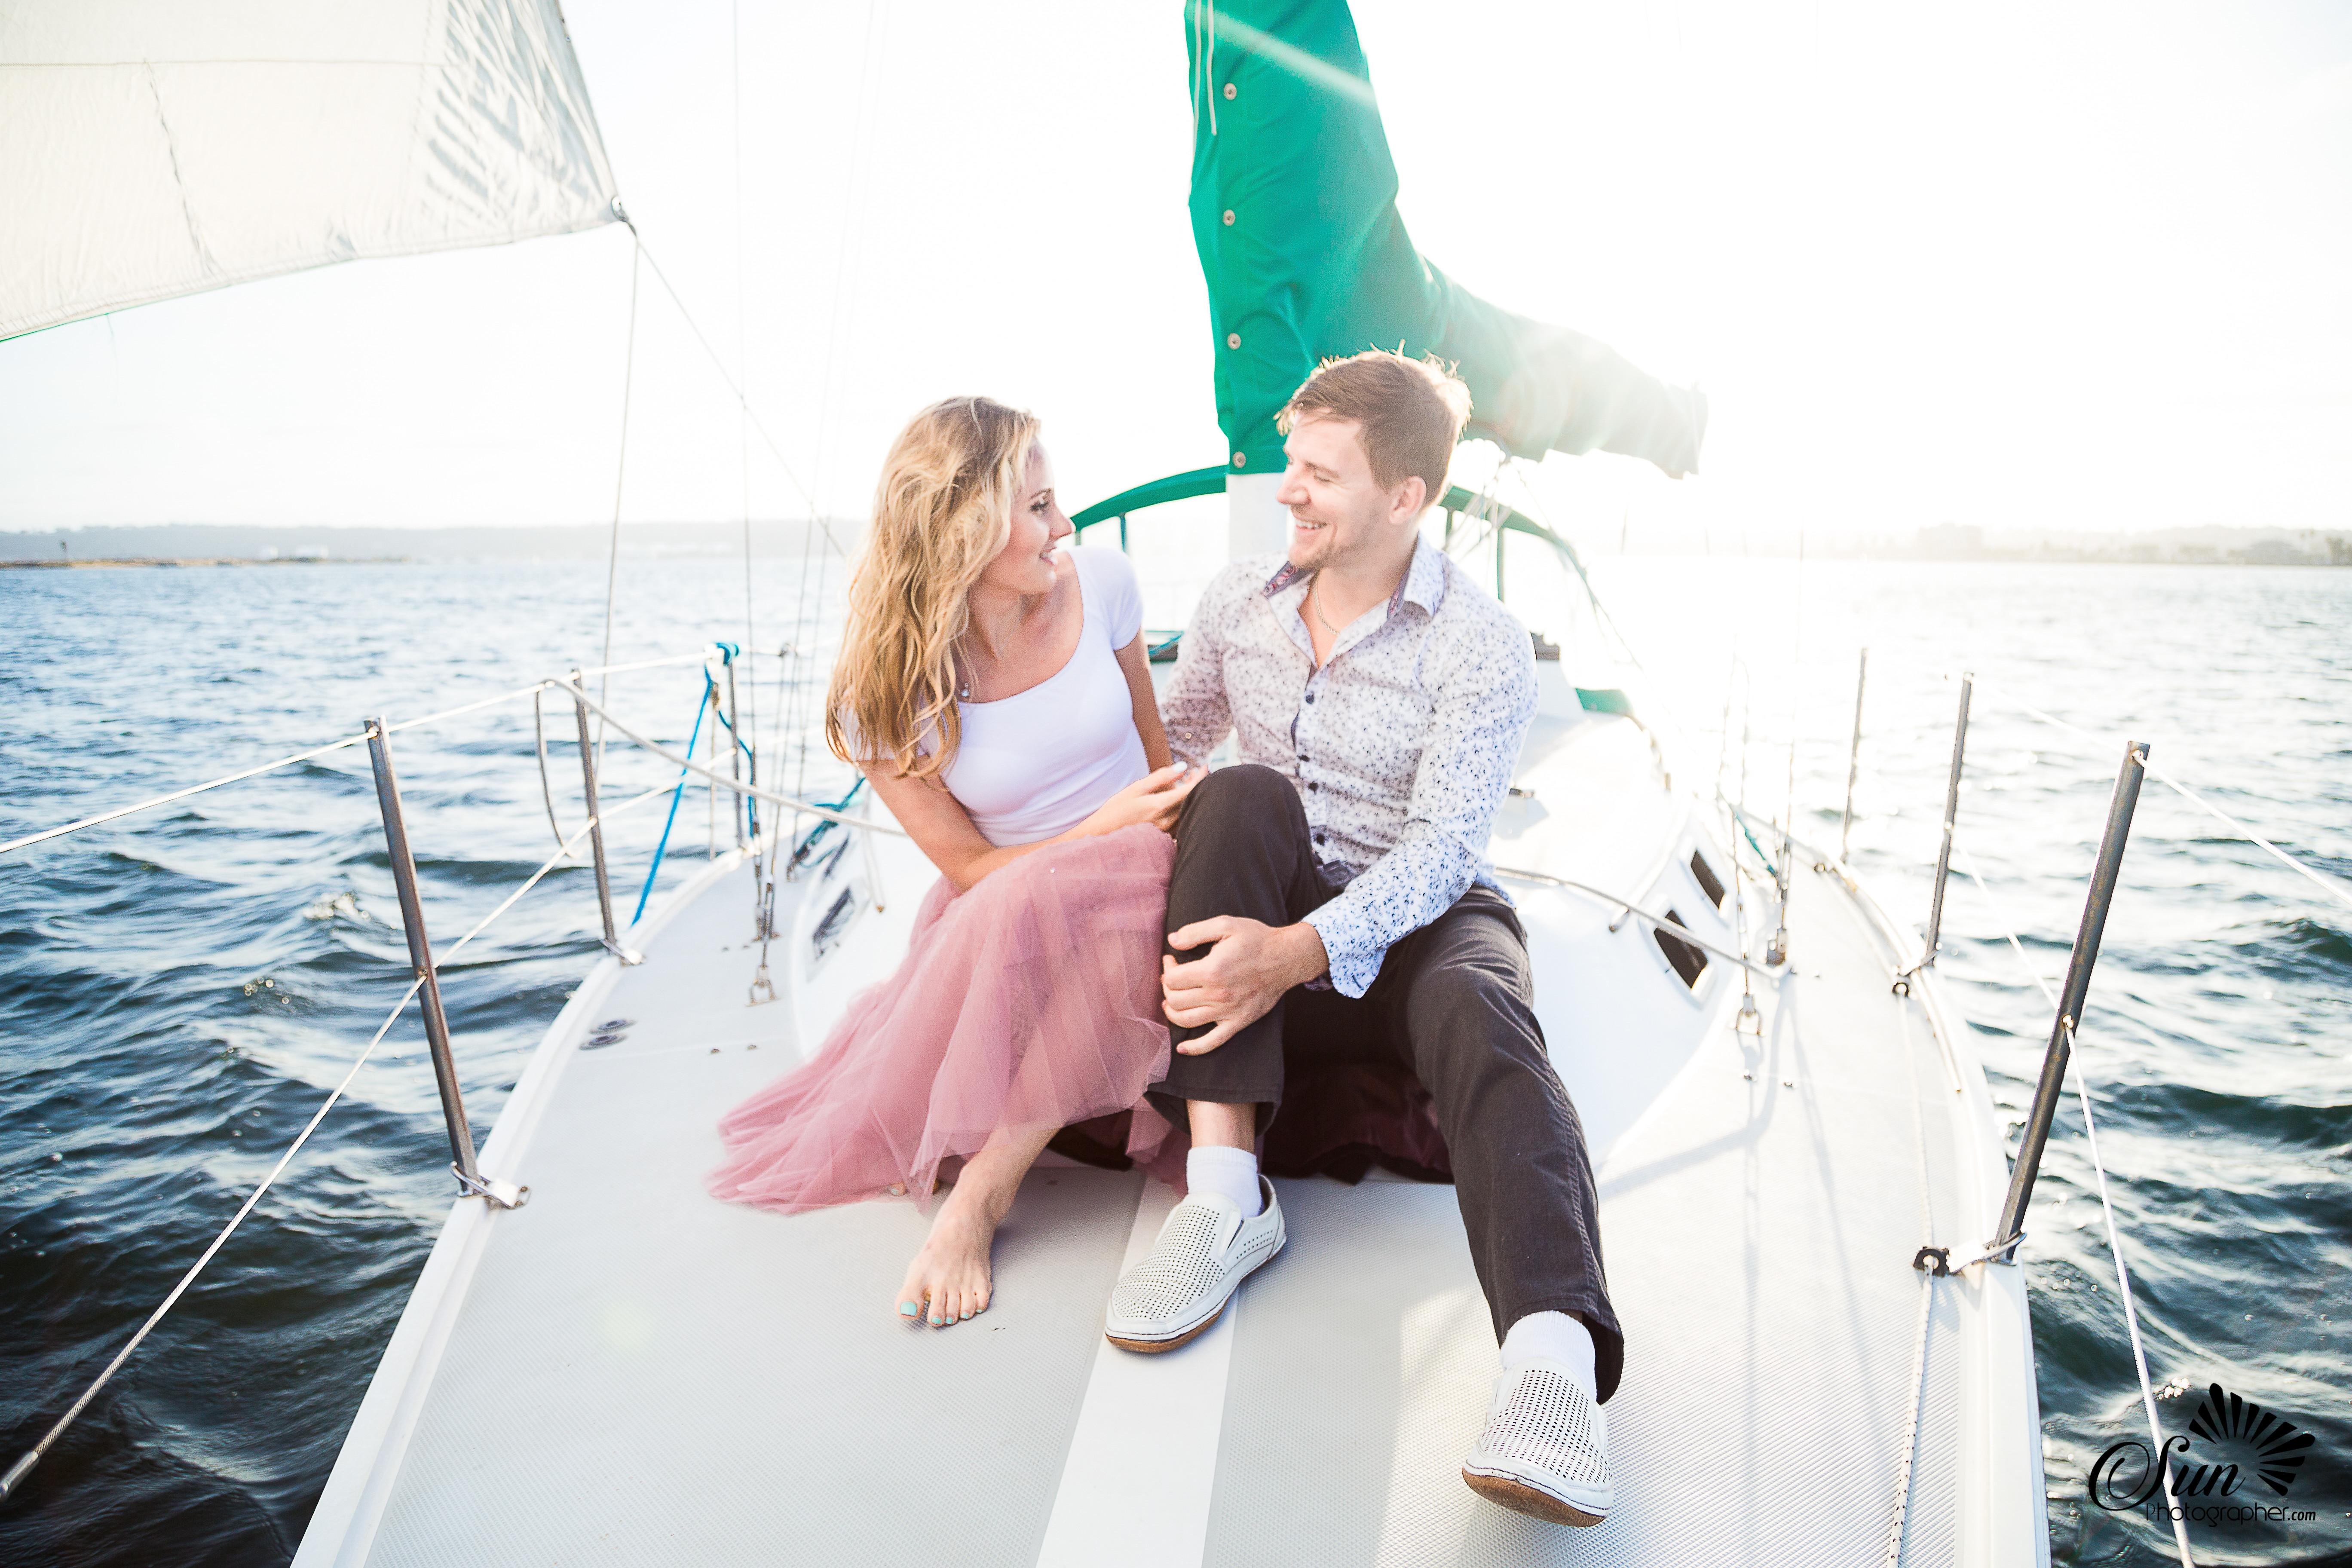 Sailboat tour + photo session